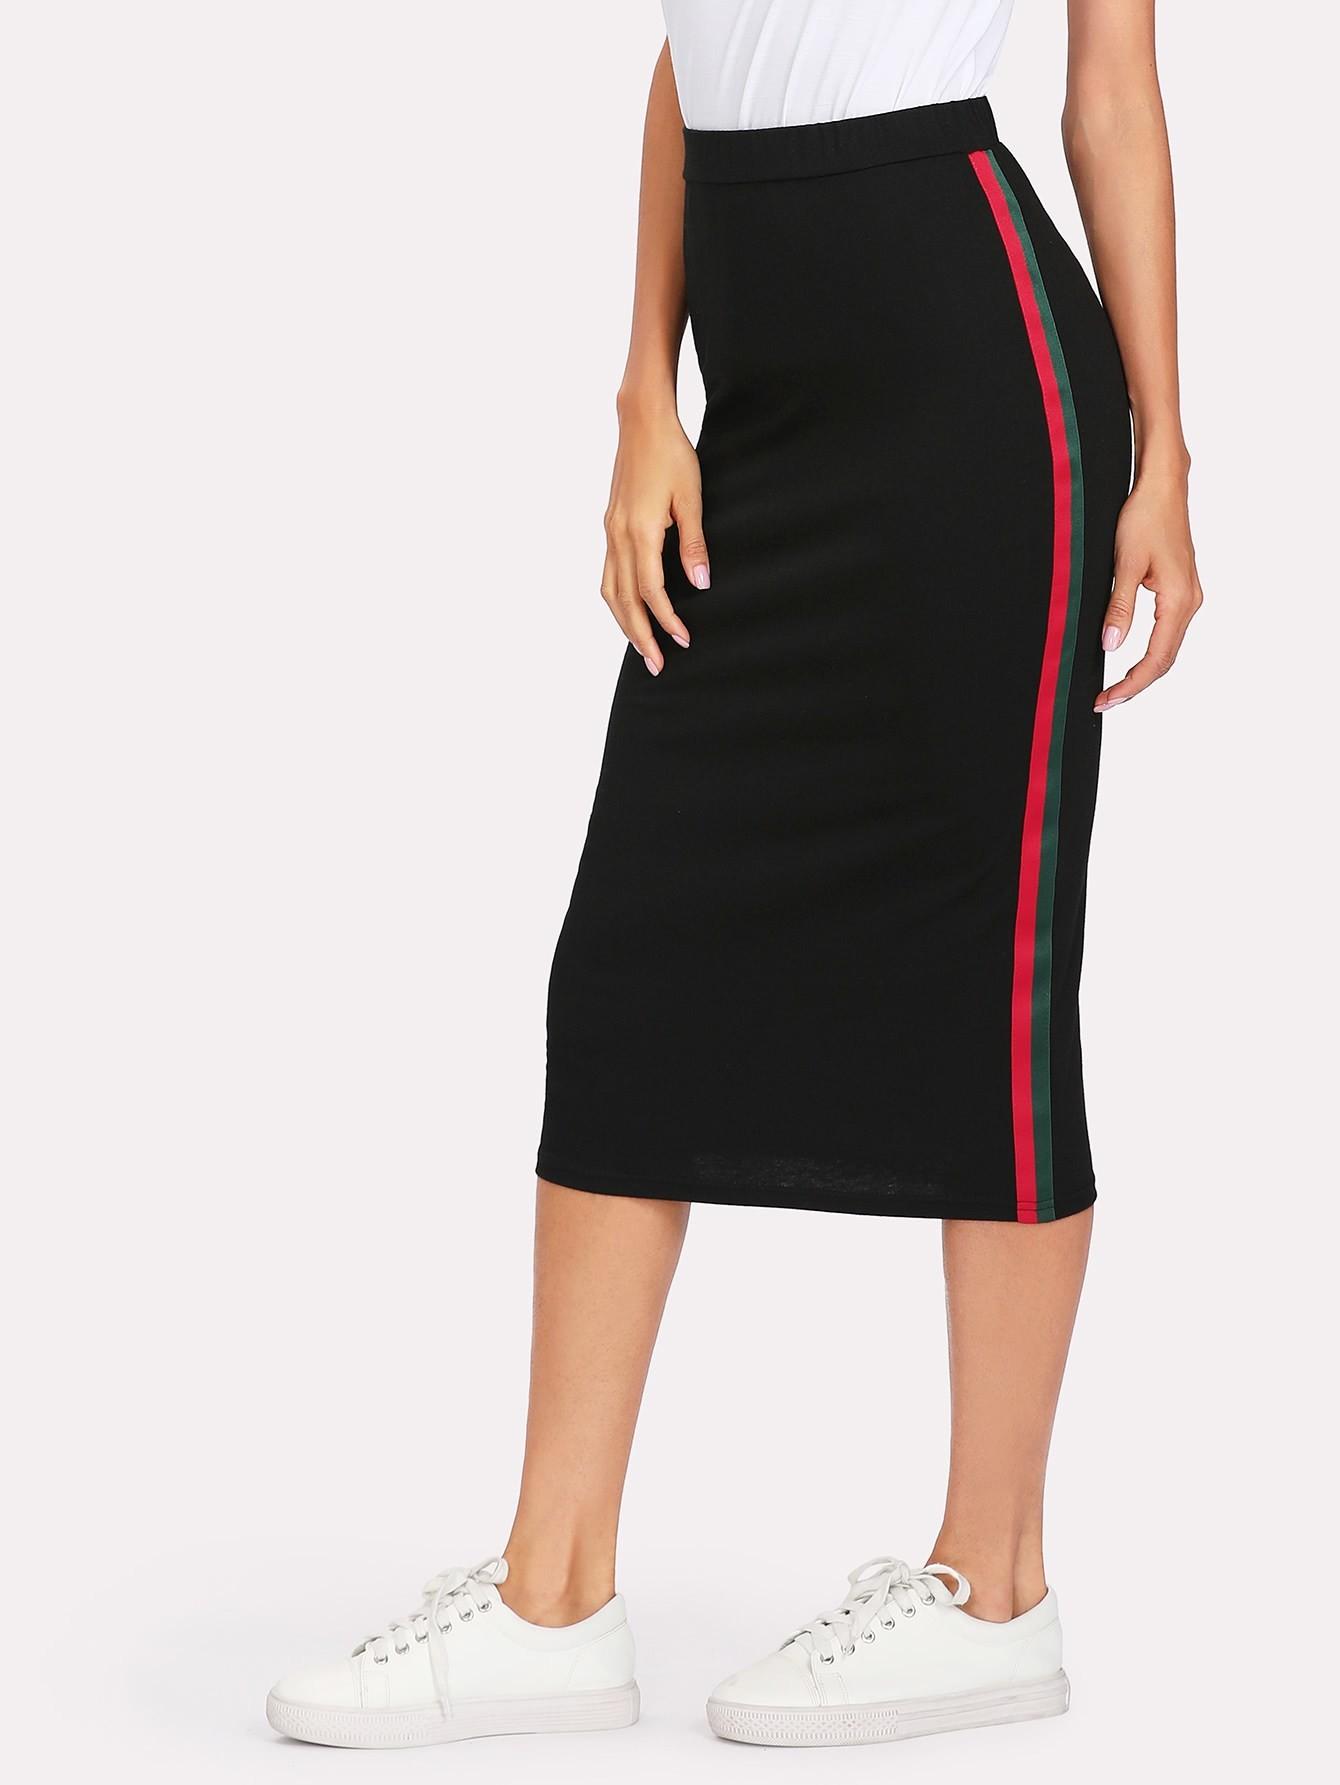 Striped Tape Side Skirt striped tape side cuffed pants